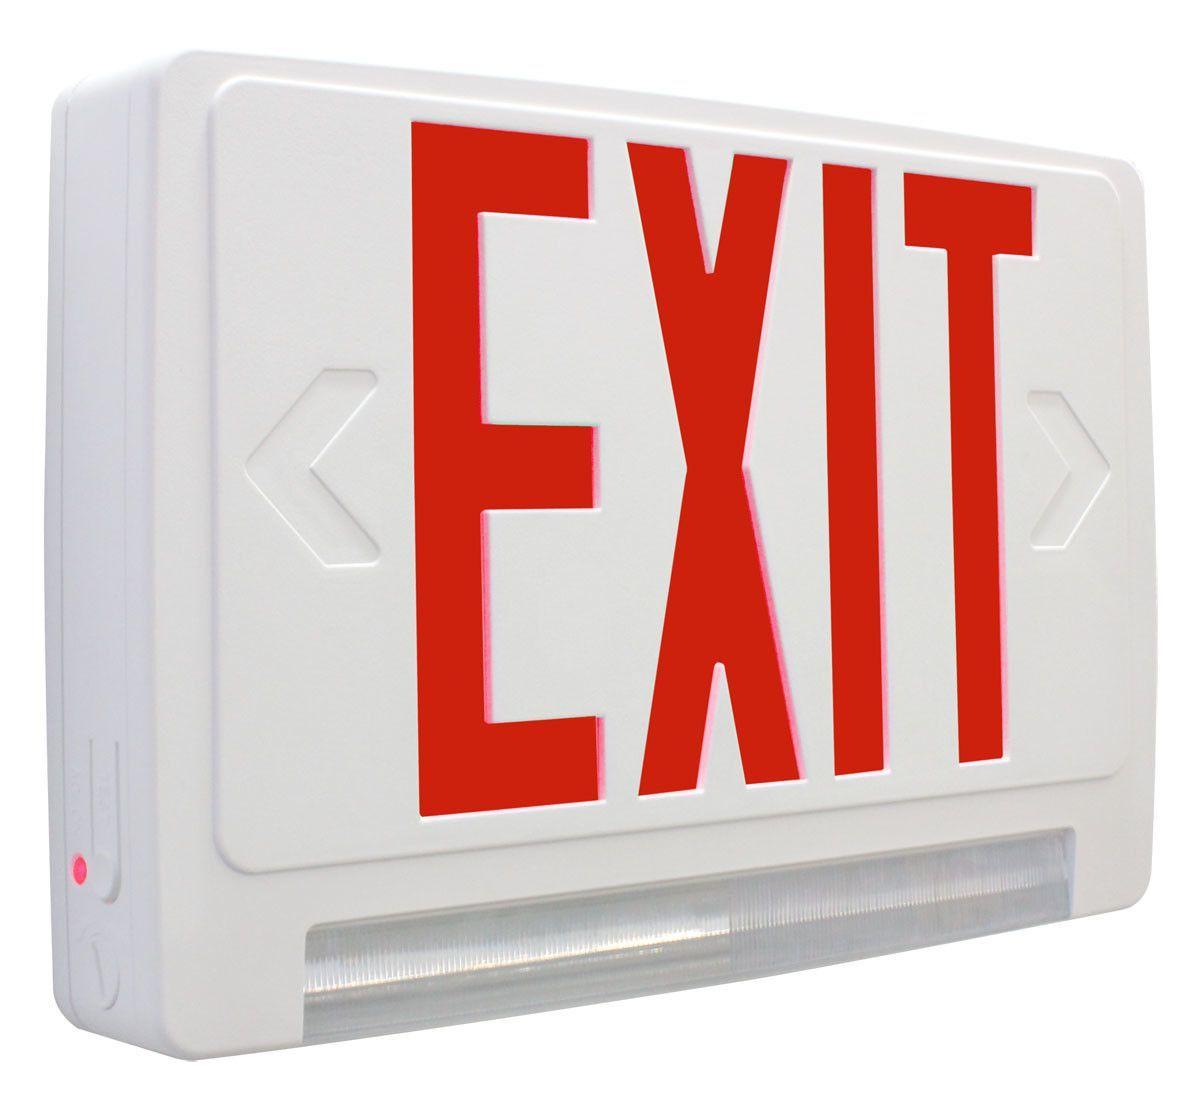 Exitronix exit led emergency combo light emergency lighting lighting emergency lighting en led for Exterior emergency exit lights